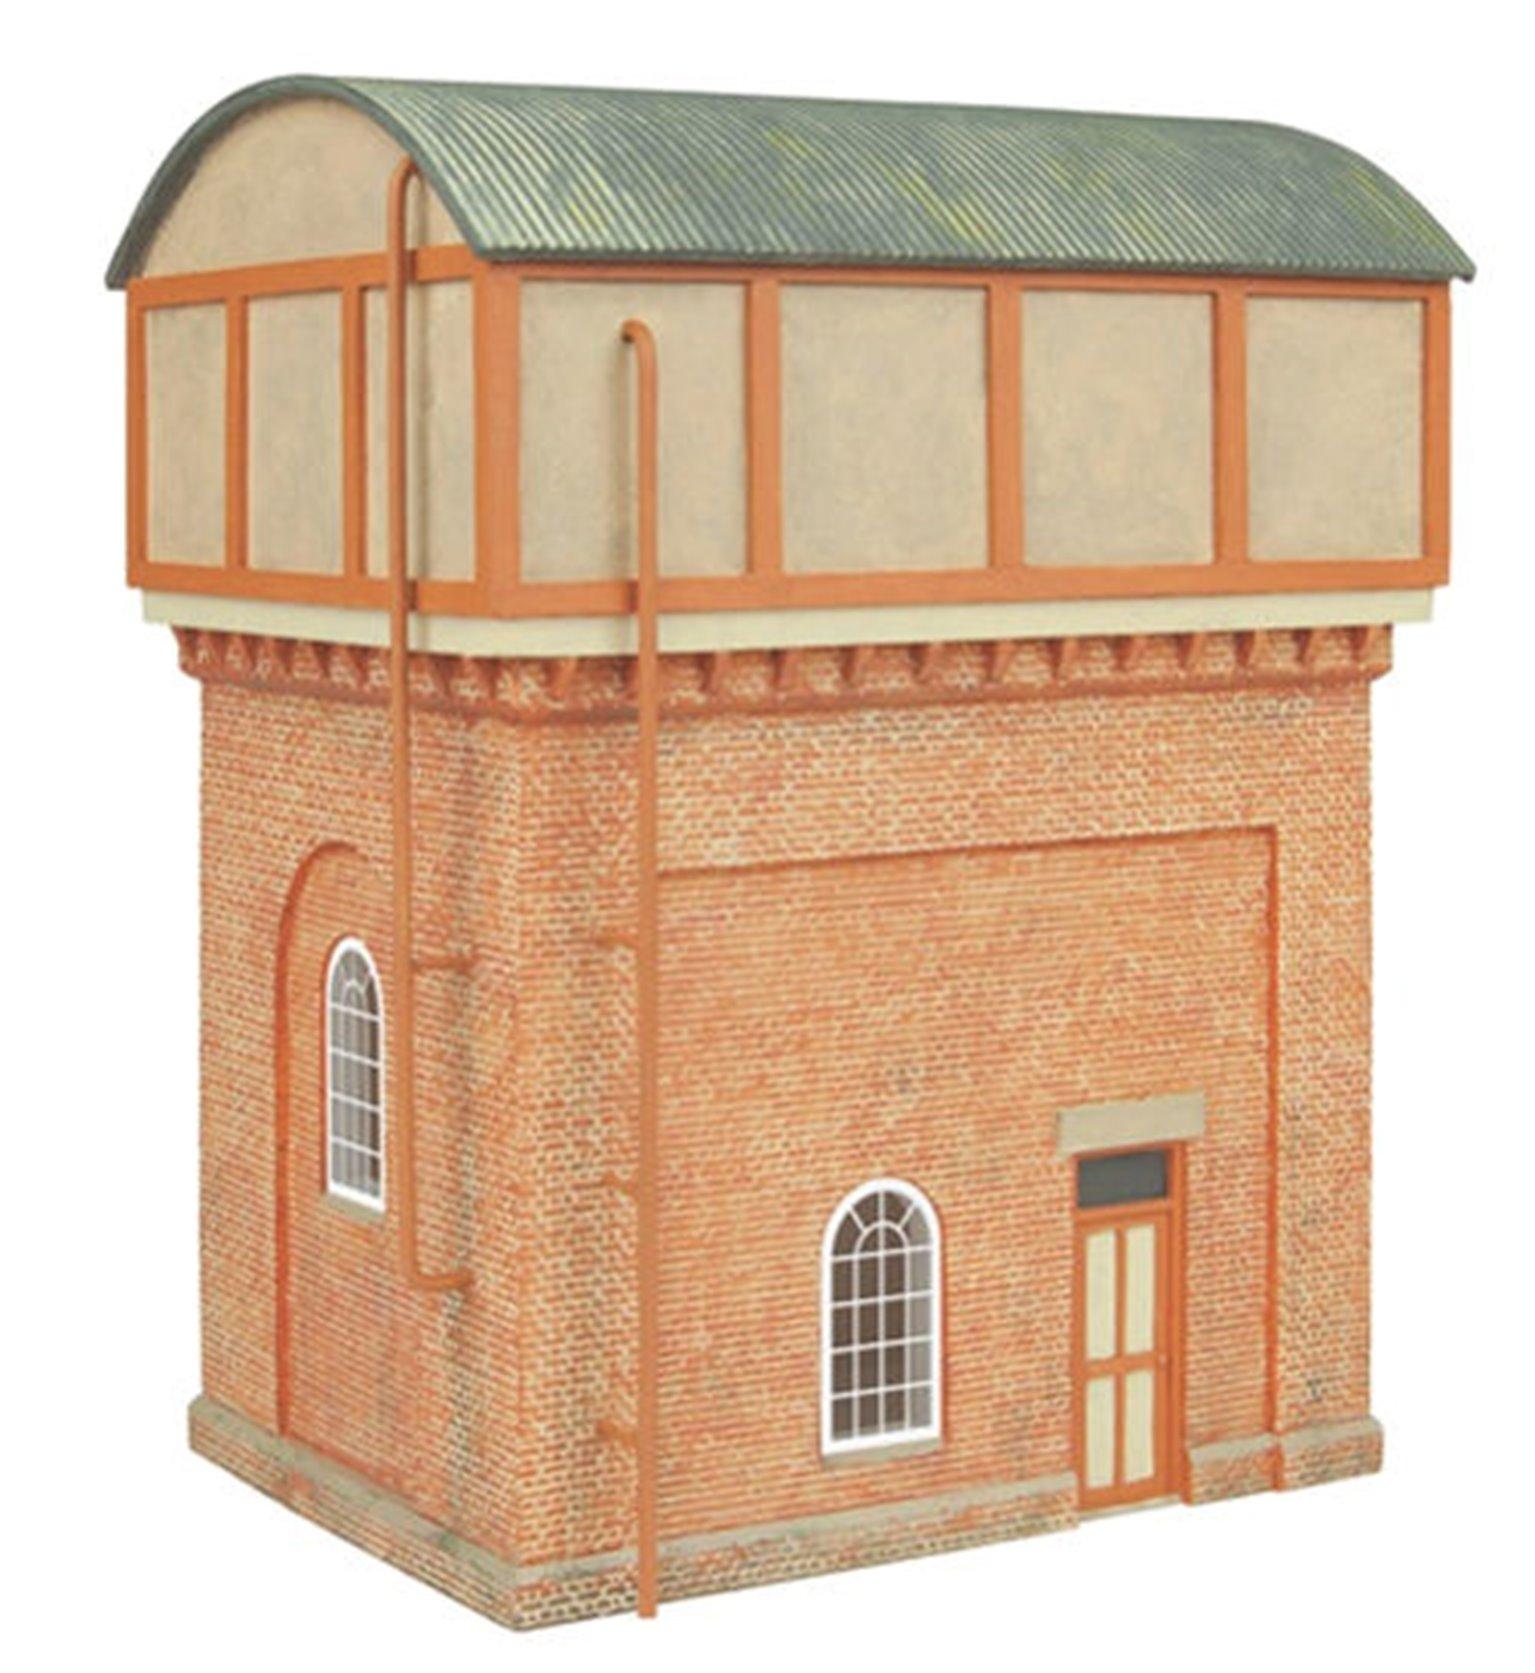 GWR Water Tower/Crane (Pre-Built)